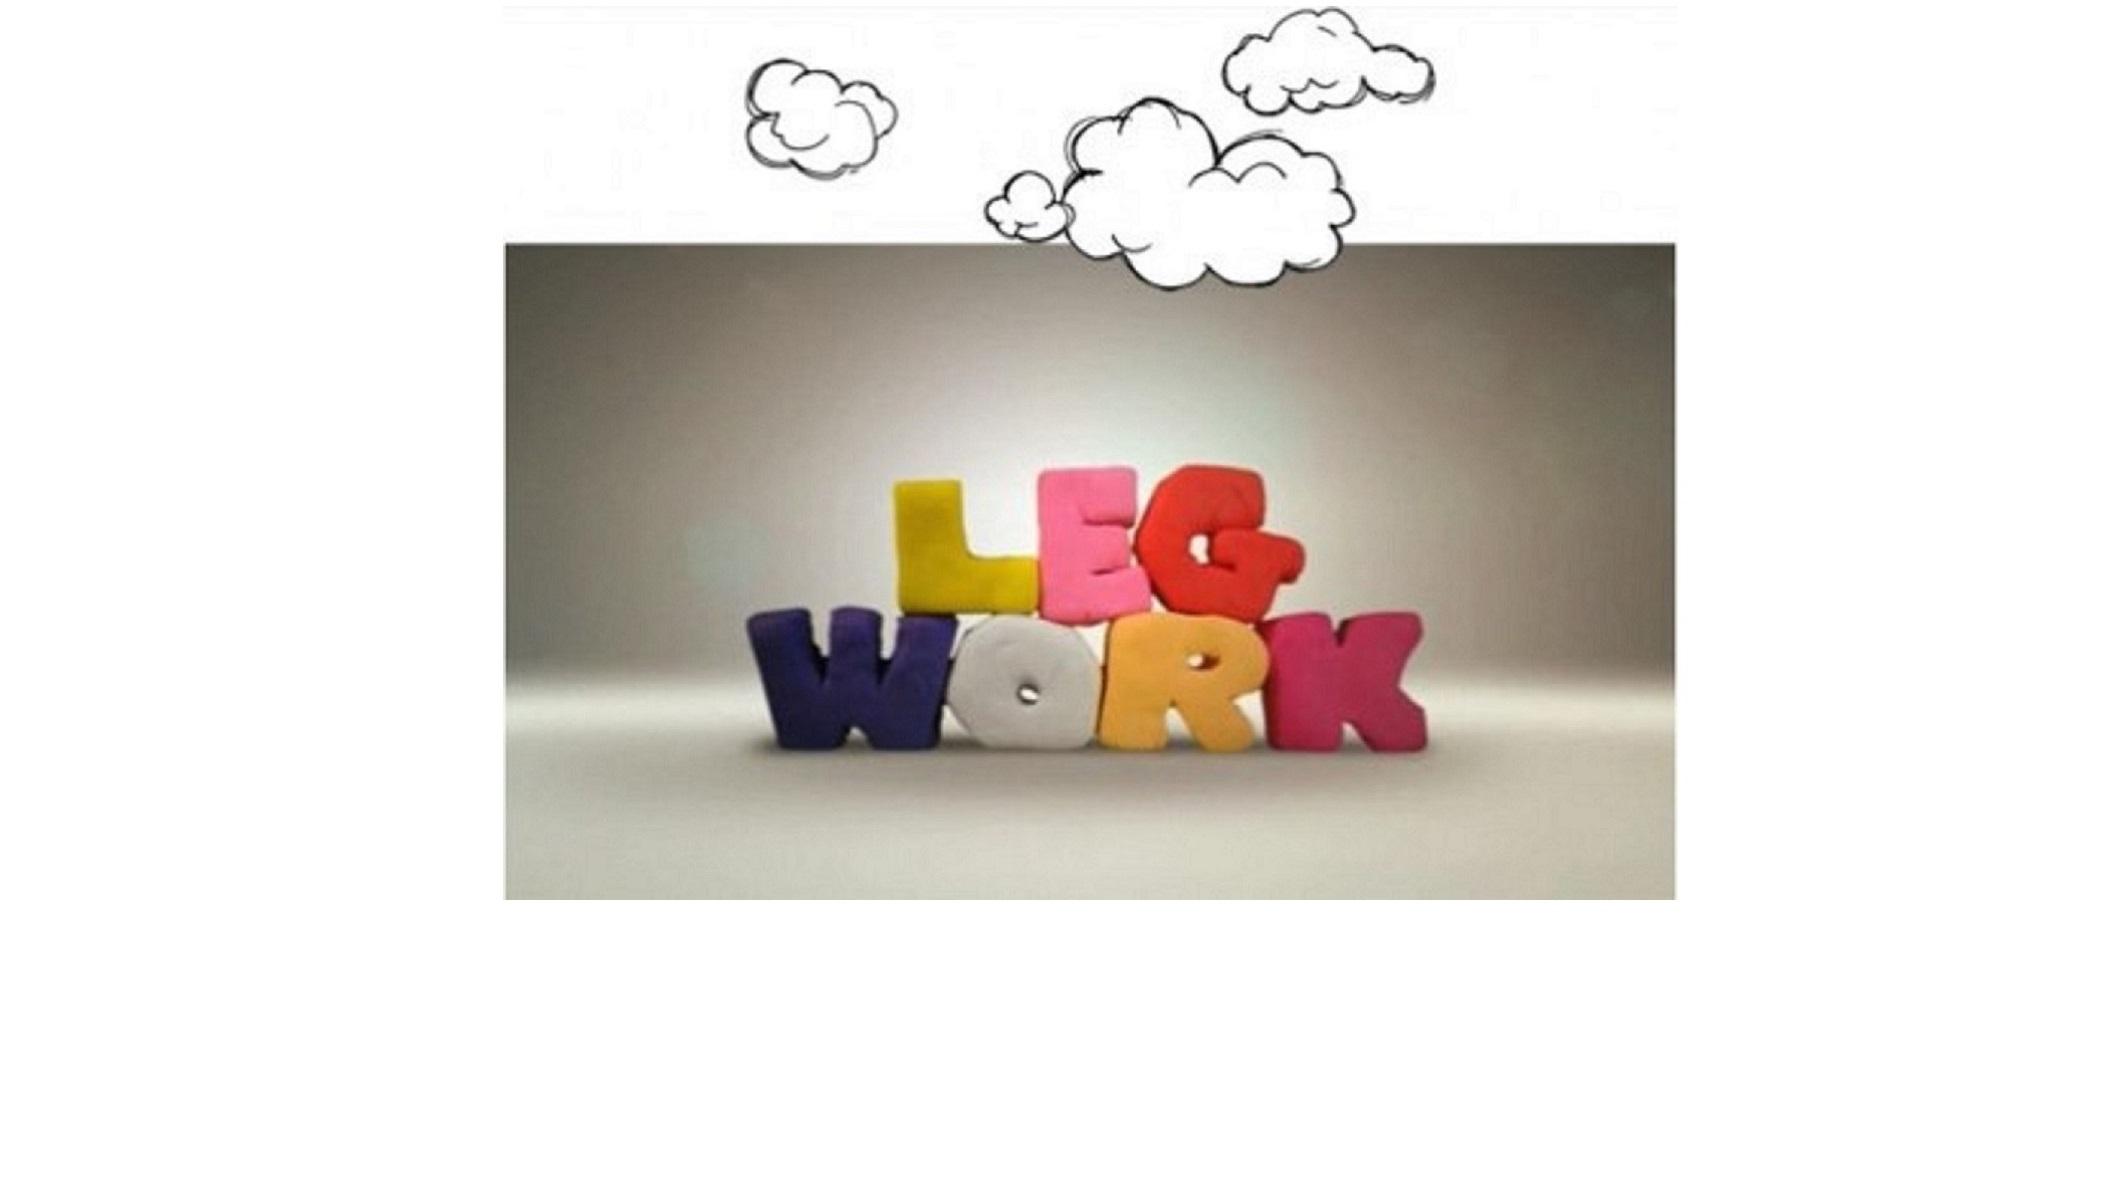 Legwork_Logo.12.18.13.jpg